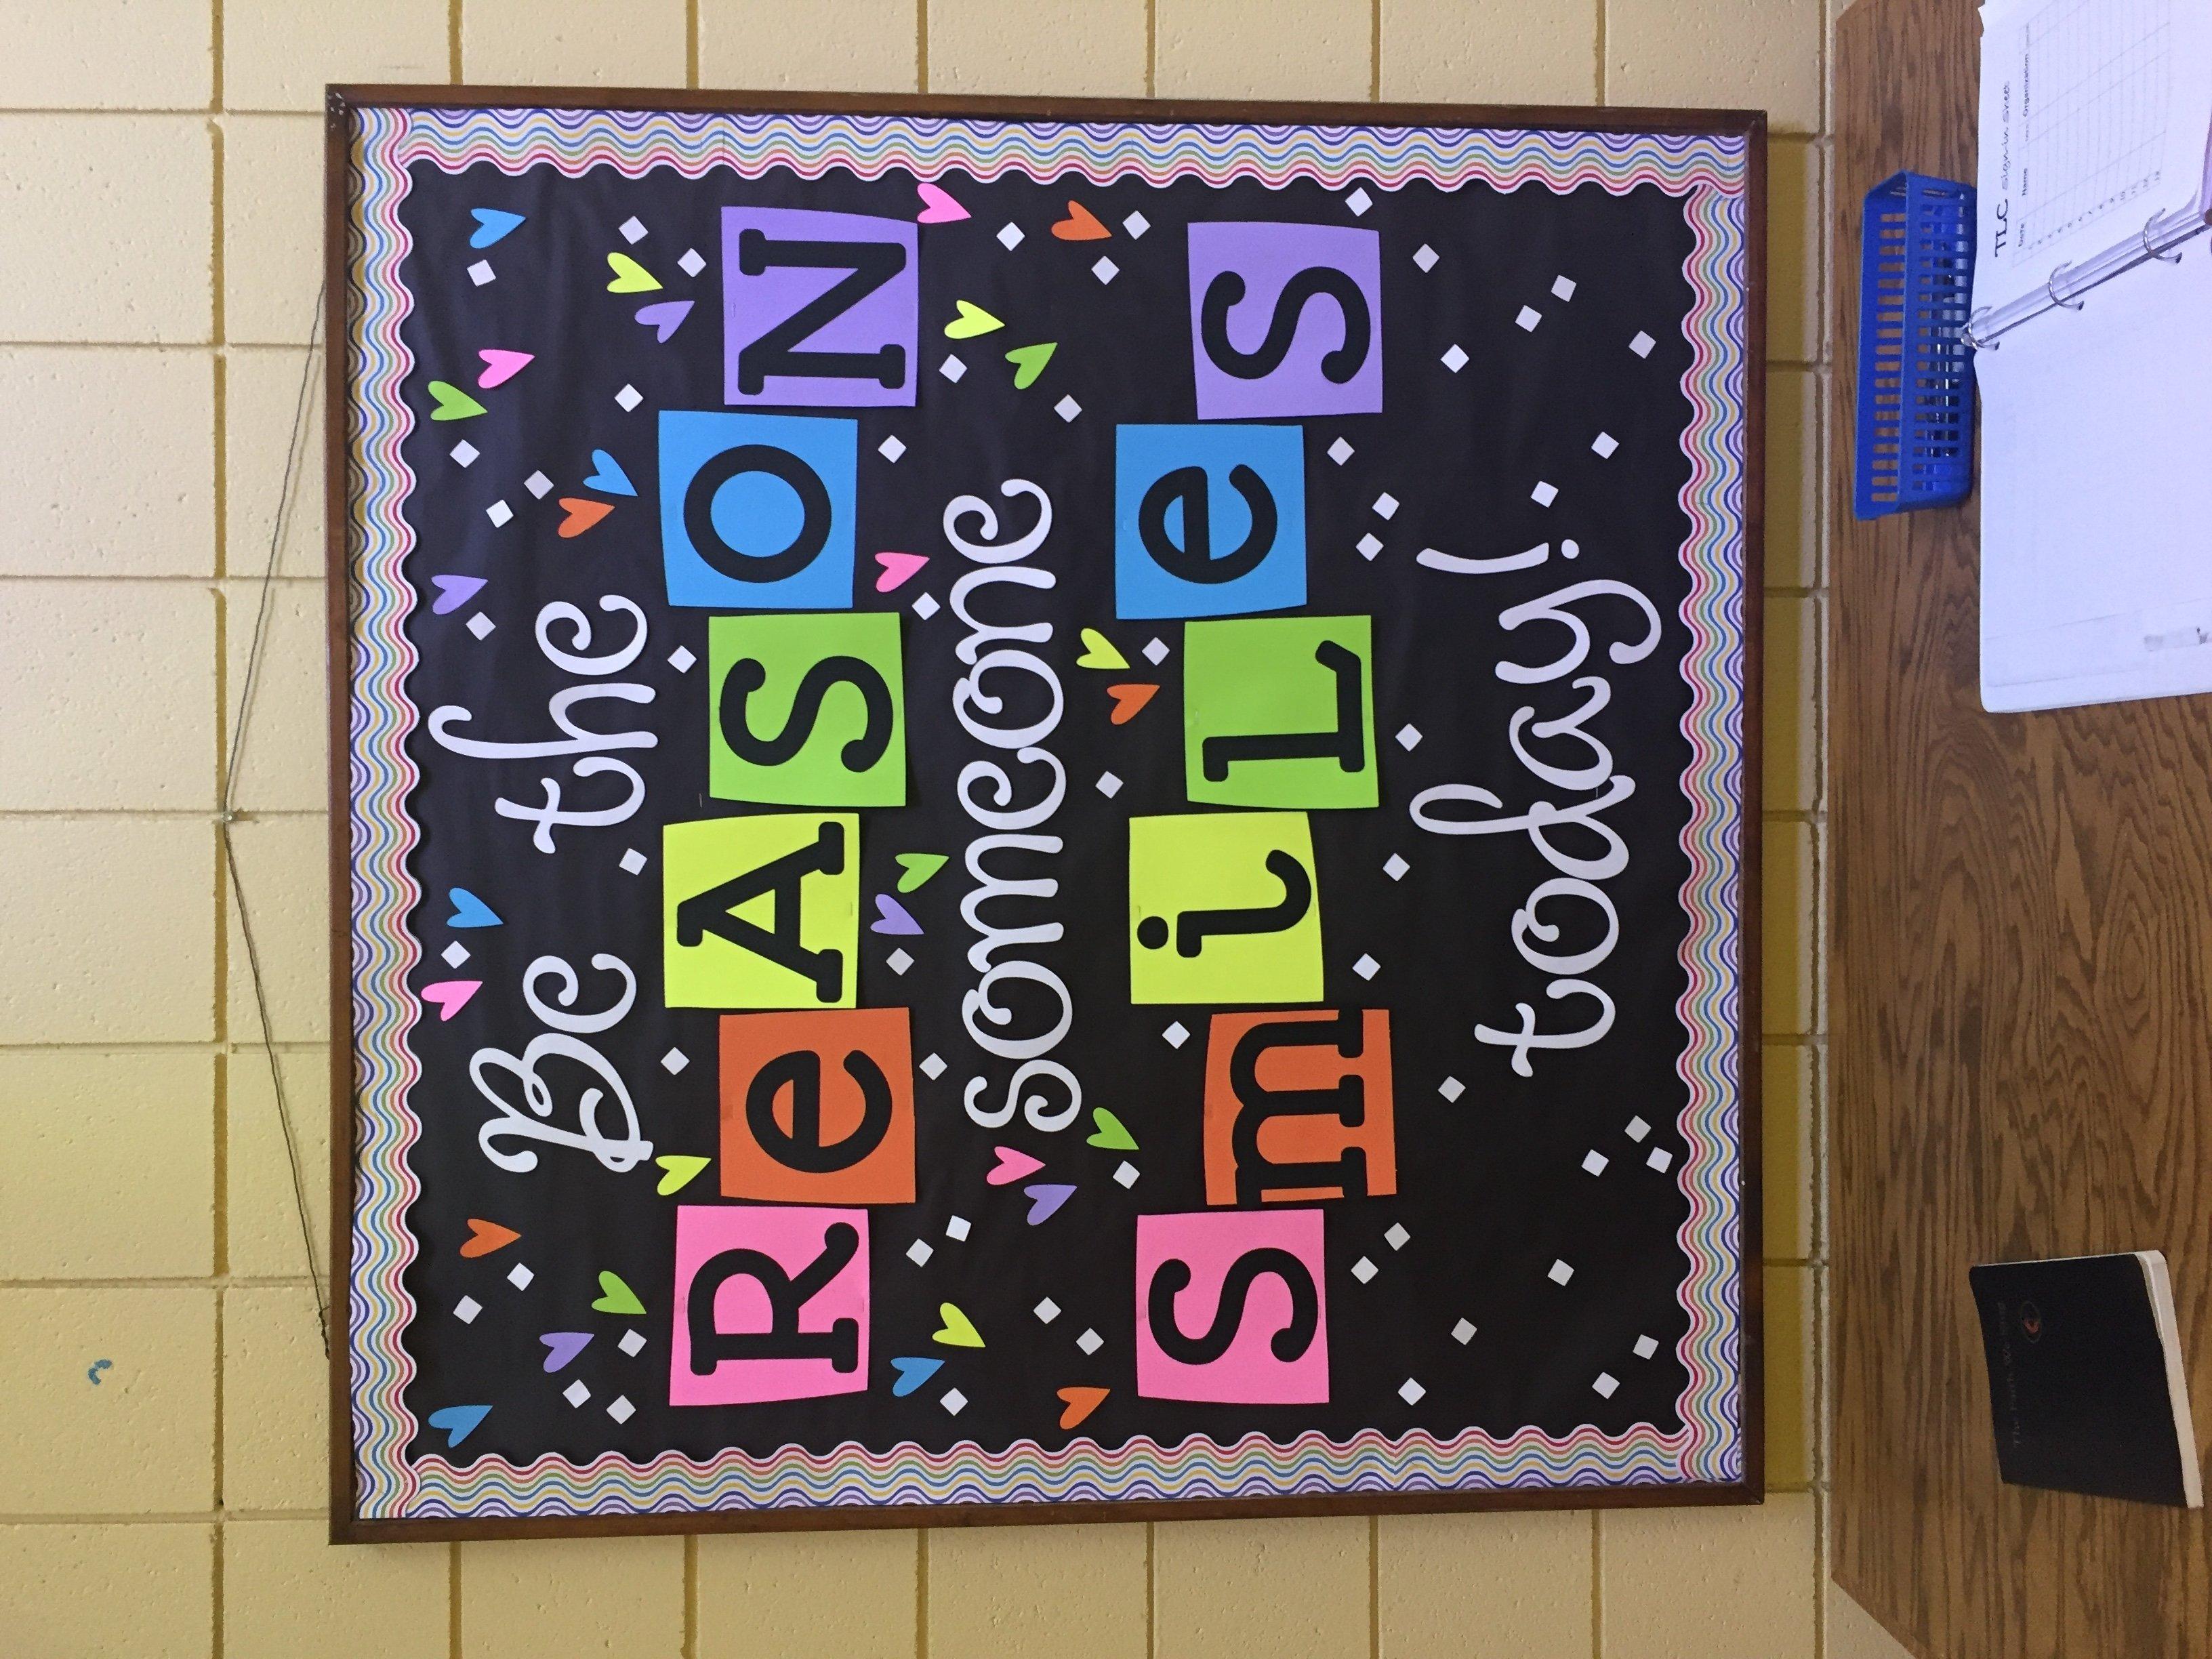 10 Best Middle School Bulletin Board Ideas 27 diy cool cork board ideas instalation photos bulletin board 1 2020